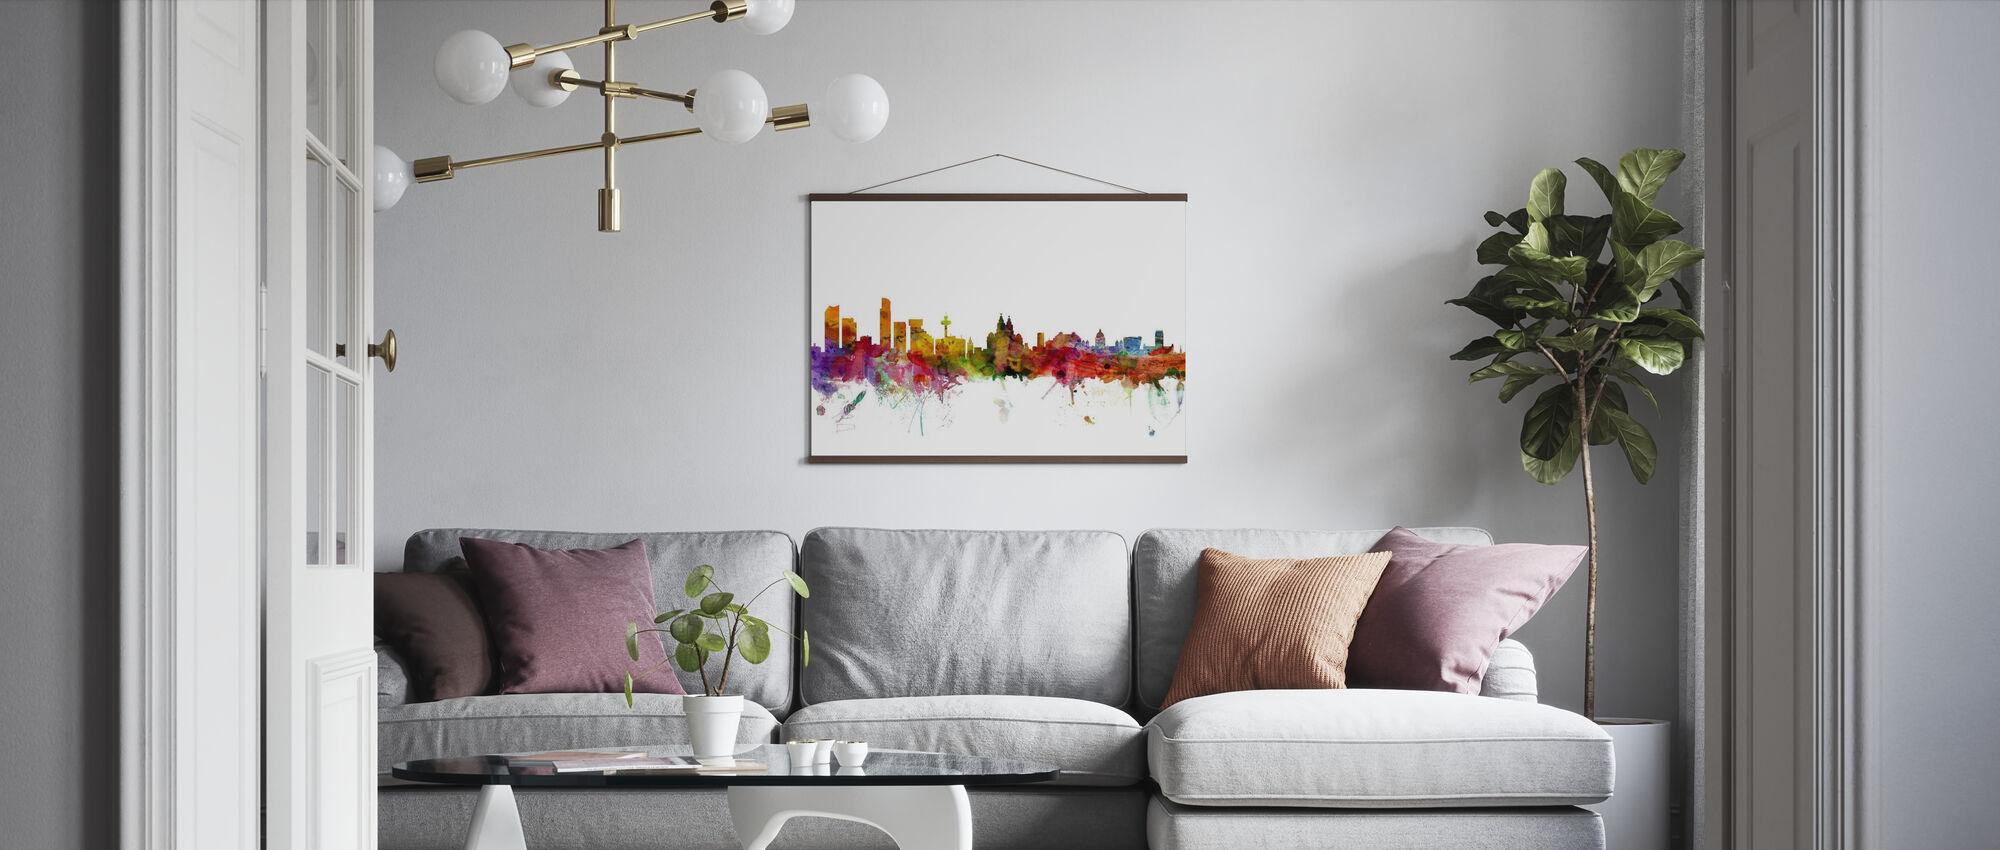 Liverpool Skyline - Poster - Living Room